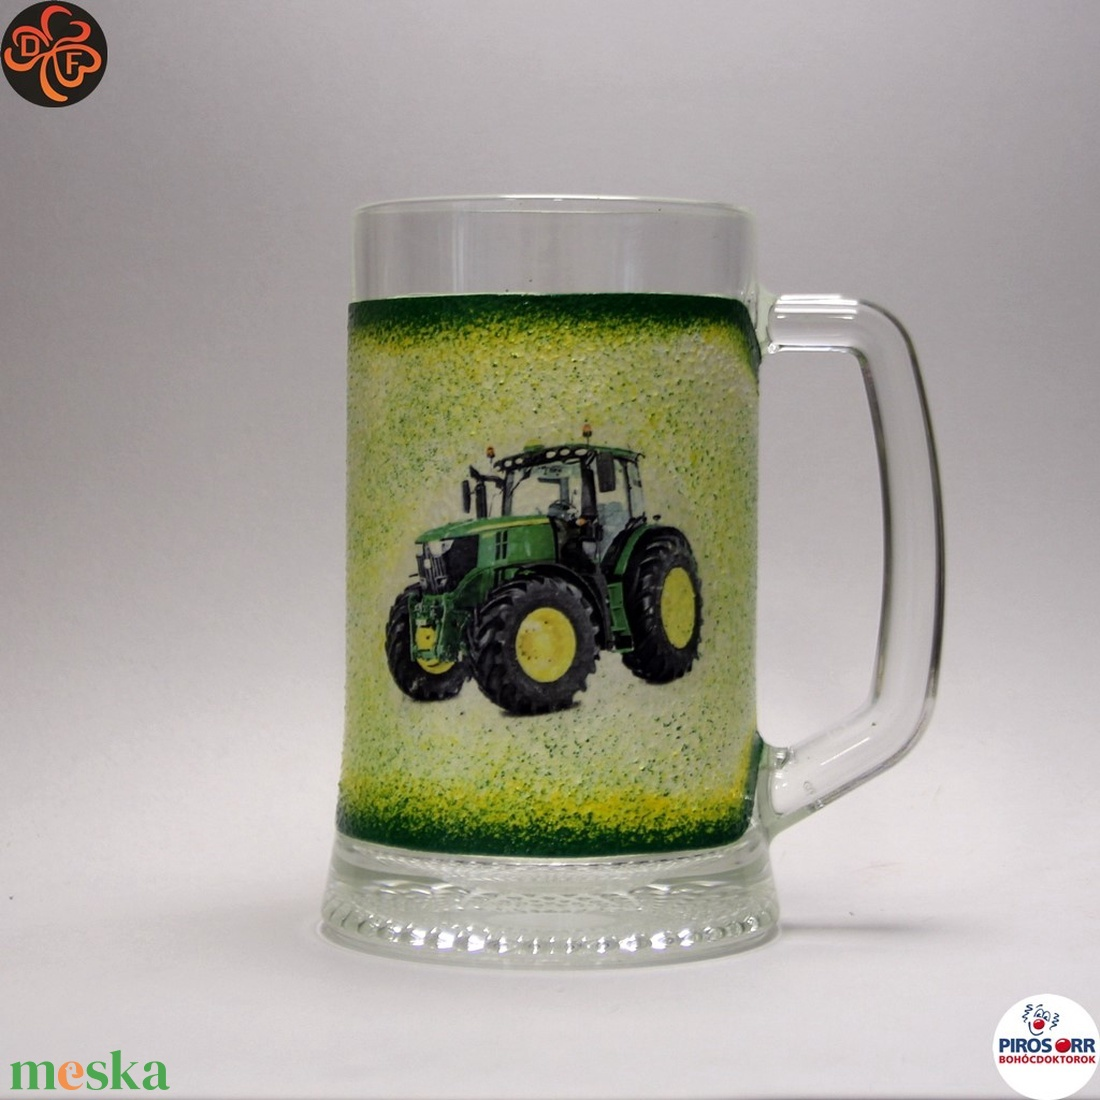 Gazda sörös korsója ; John Deere Traktor  ; Saját traktorod fényképével is! (decorfantasy) - Meska.hu